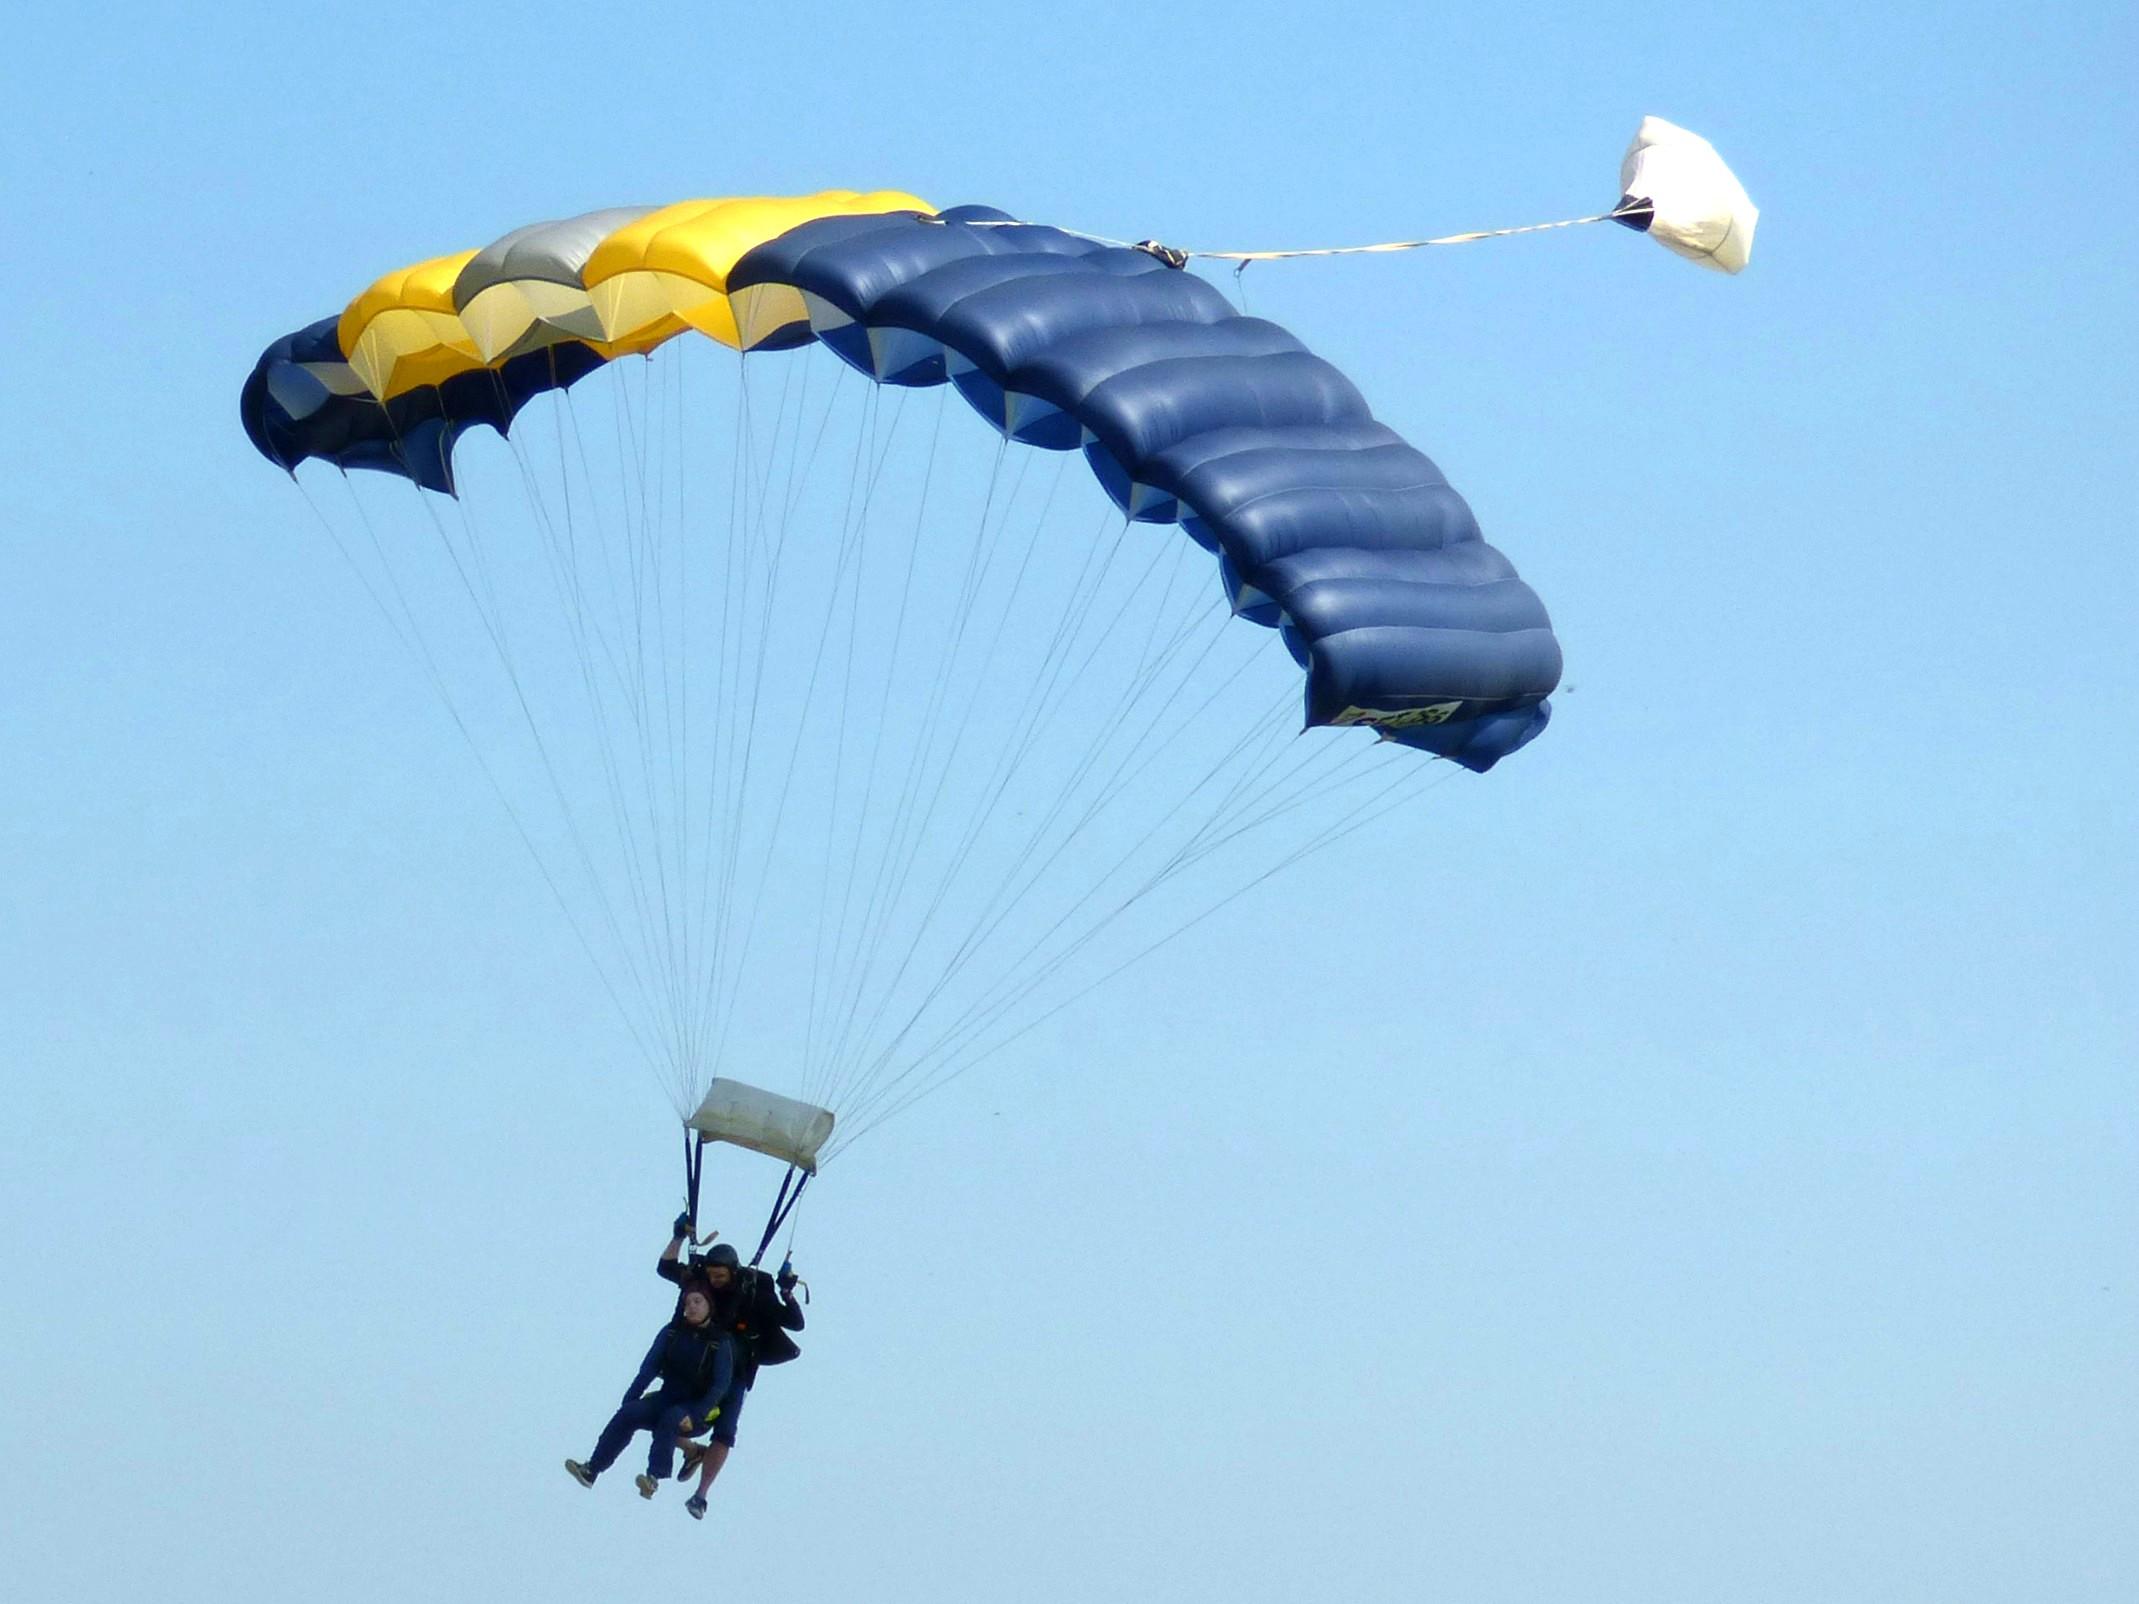 Tandem-Charity-Skydive-UK-Parachuting